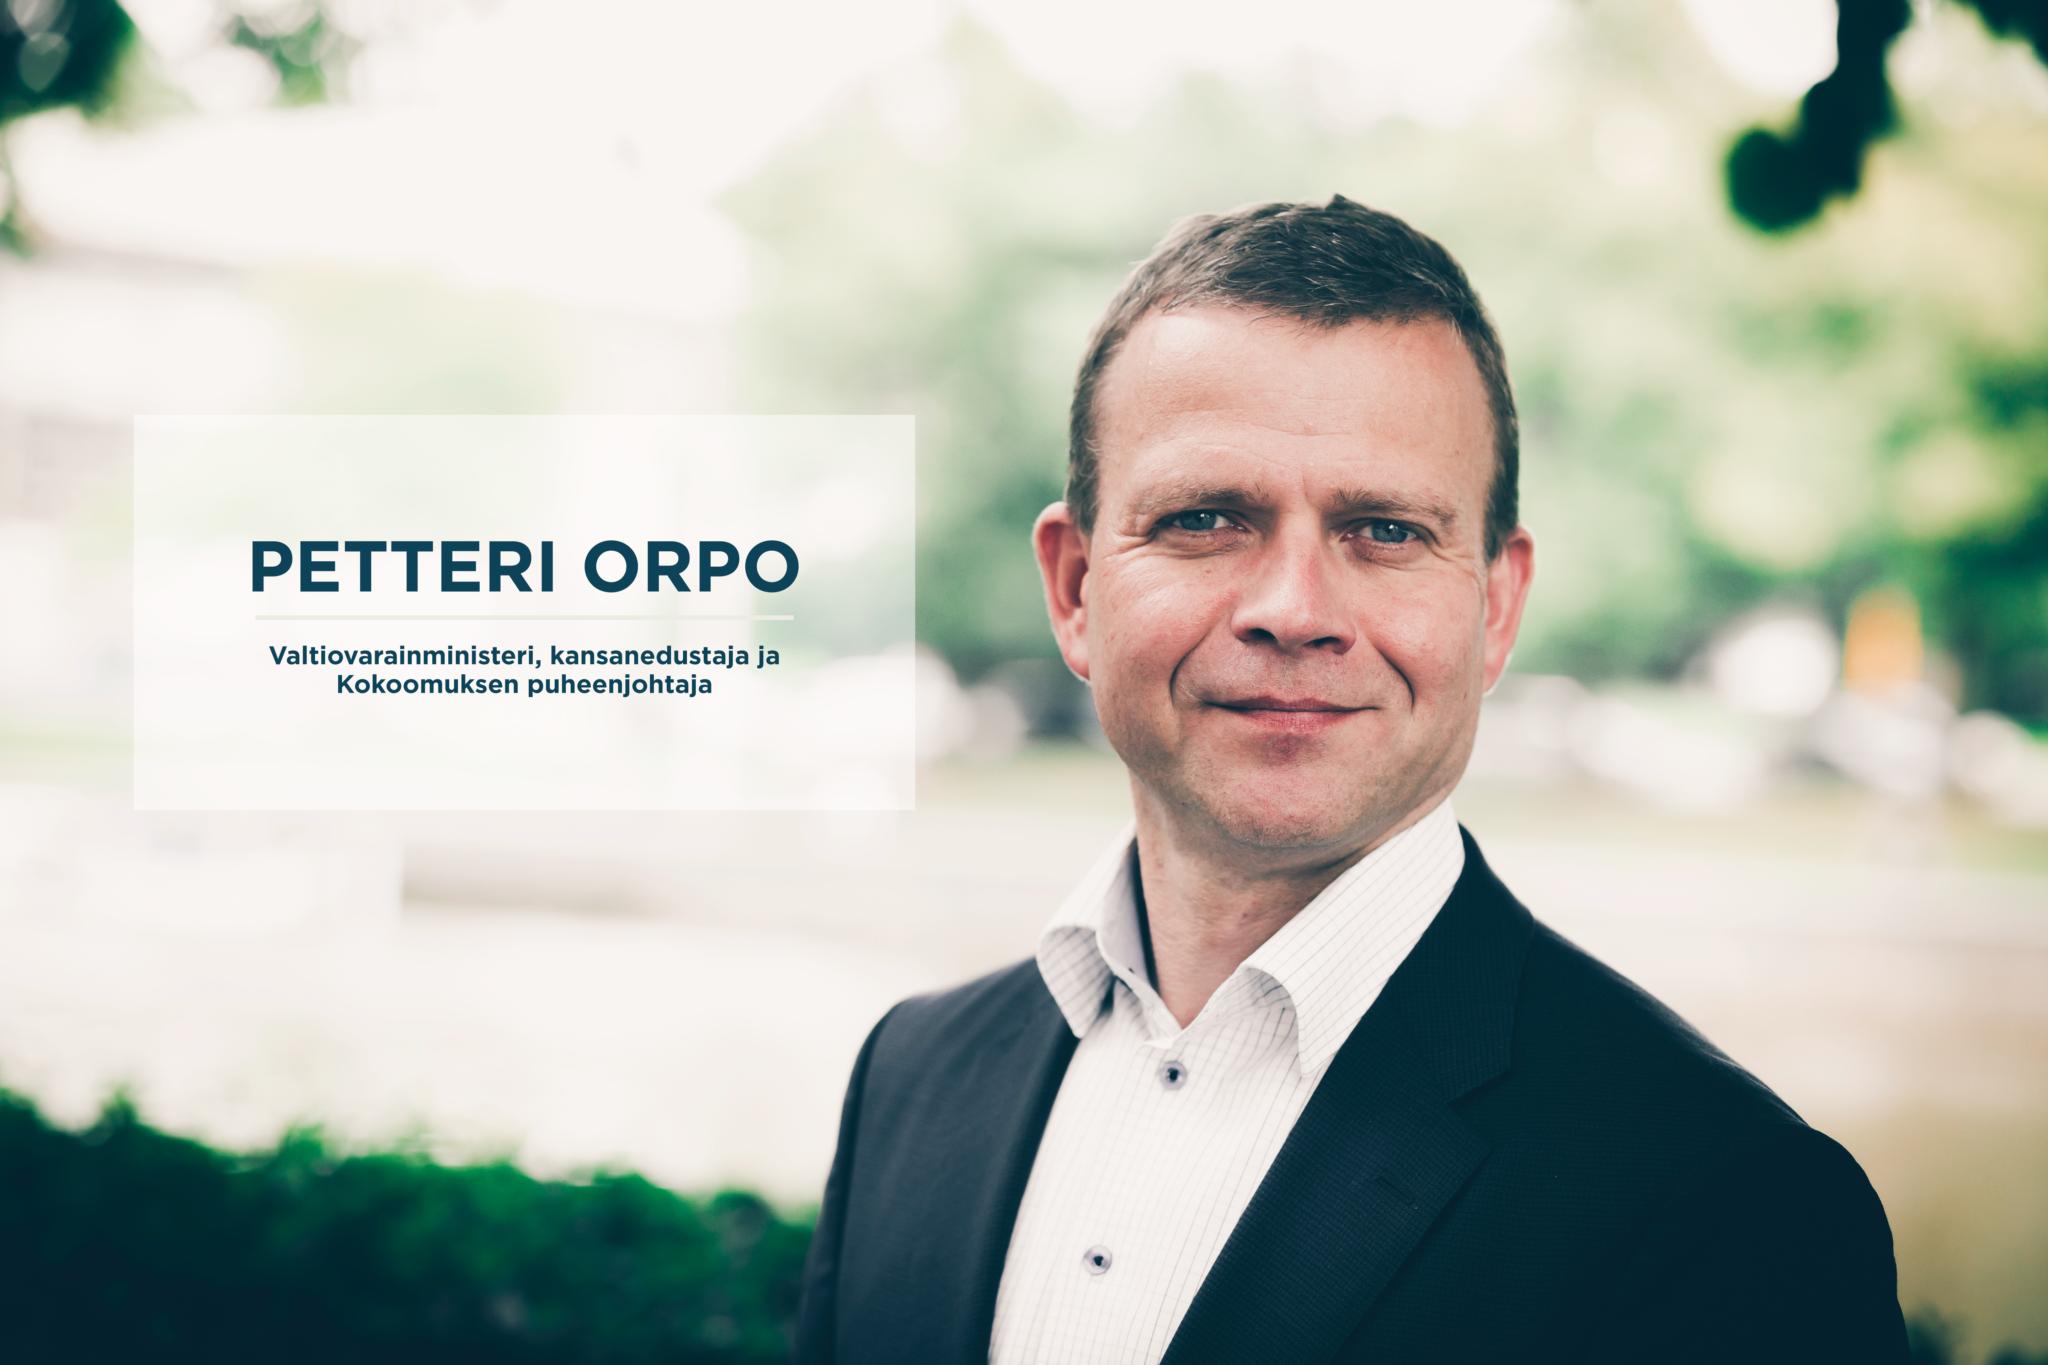 www.petteriorpo.fi